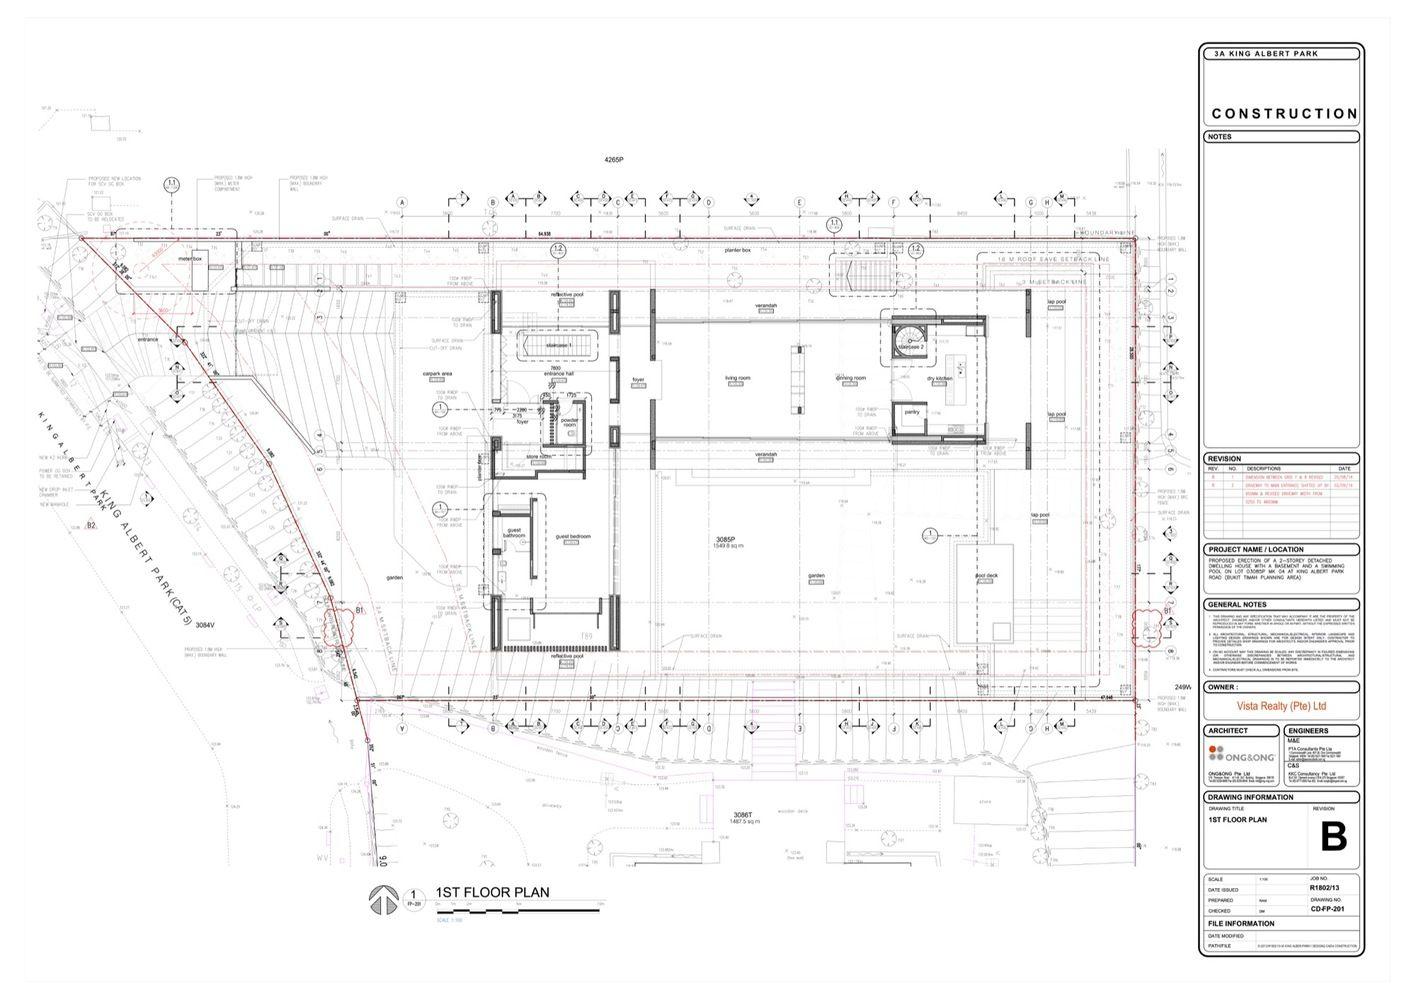 Kap House Ong Ong Pte Ltd Floor Plans Modern House Design Basement Plans